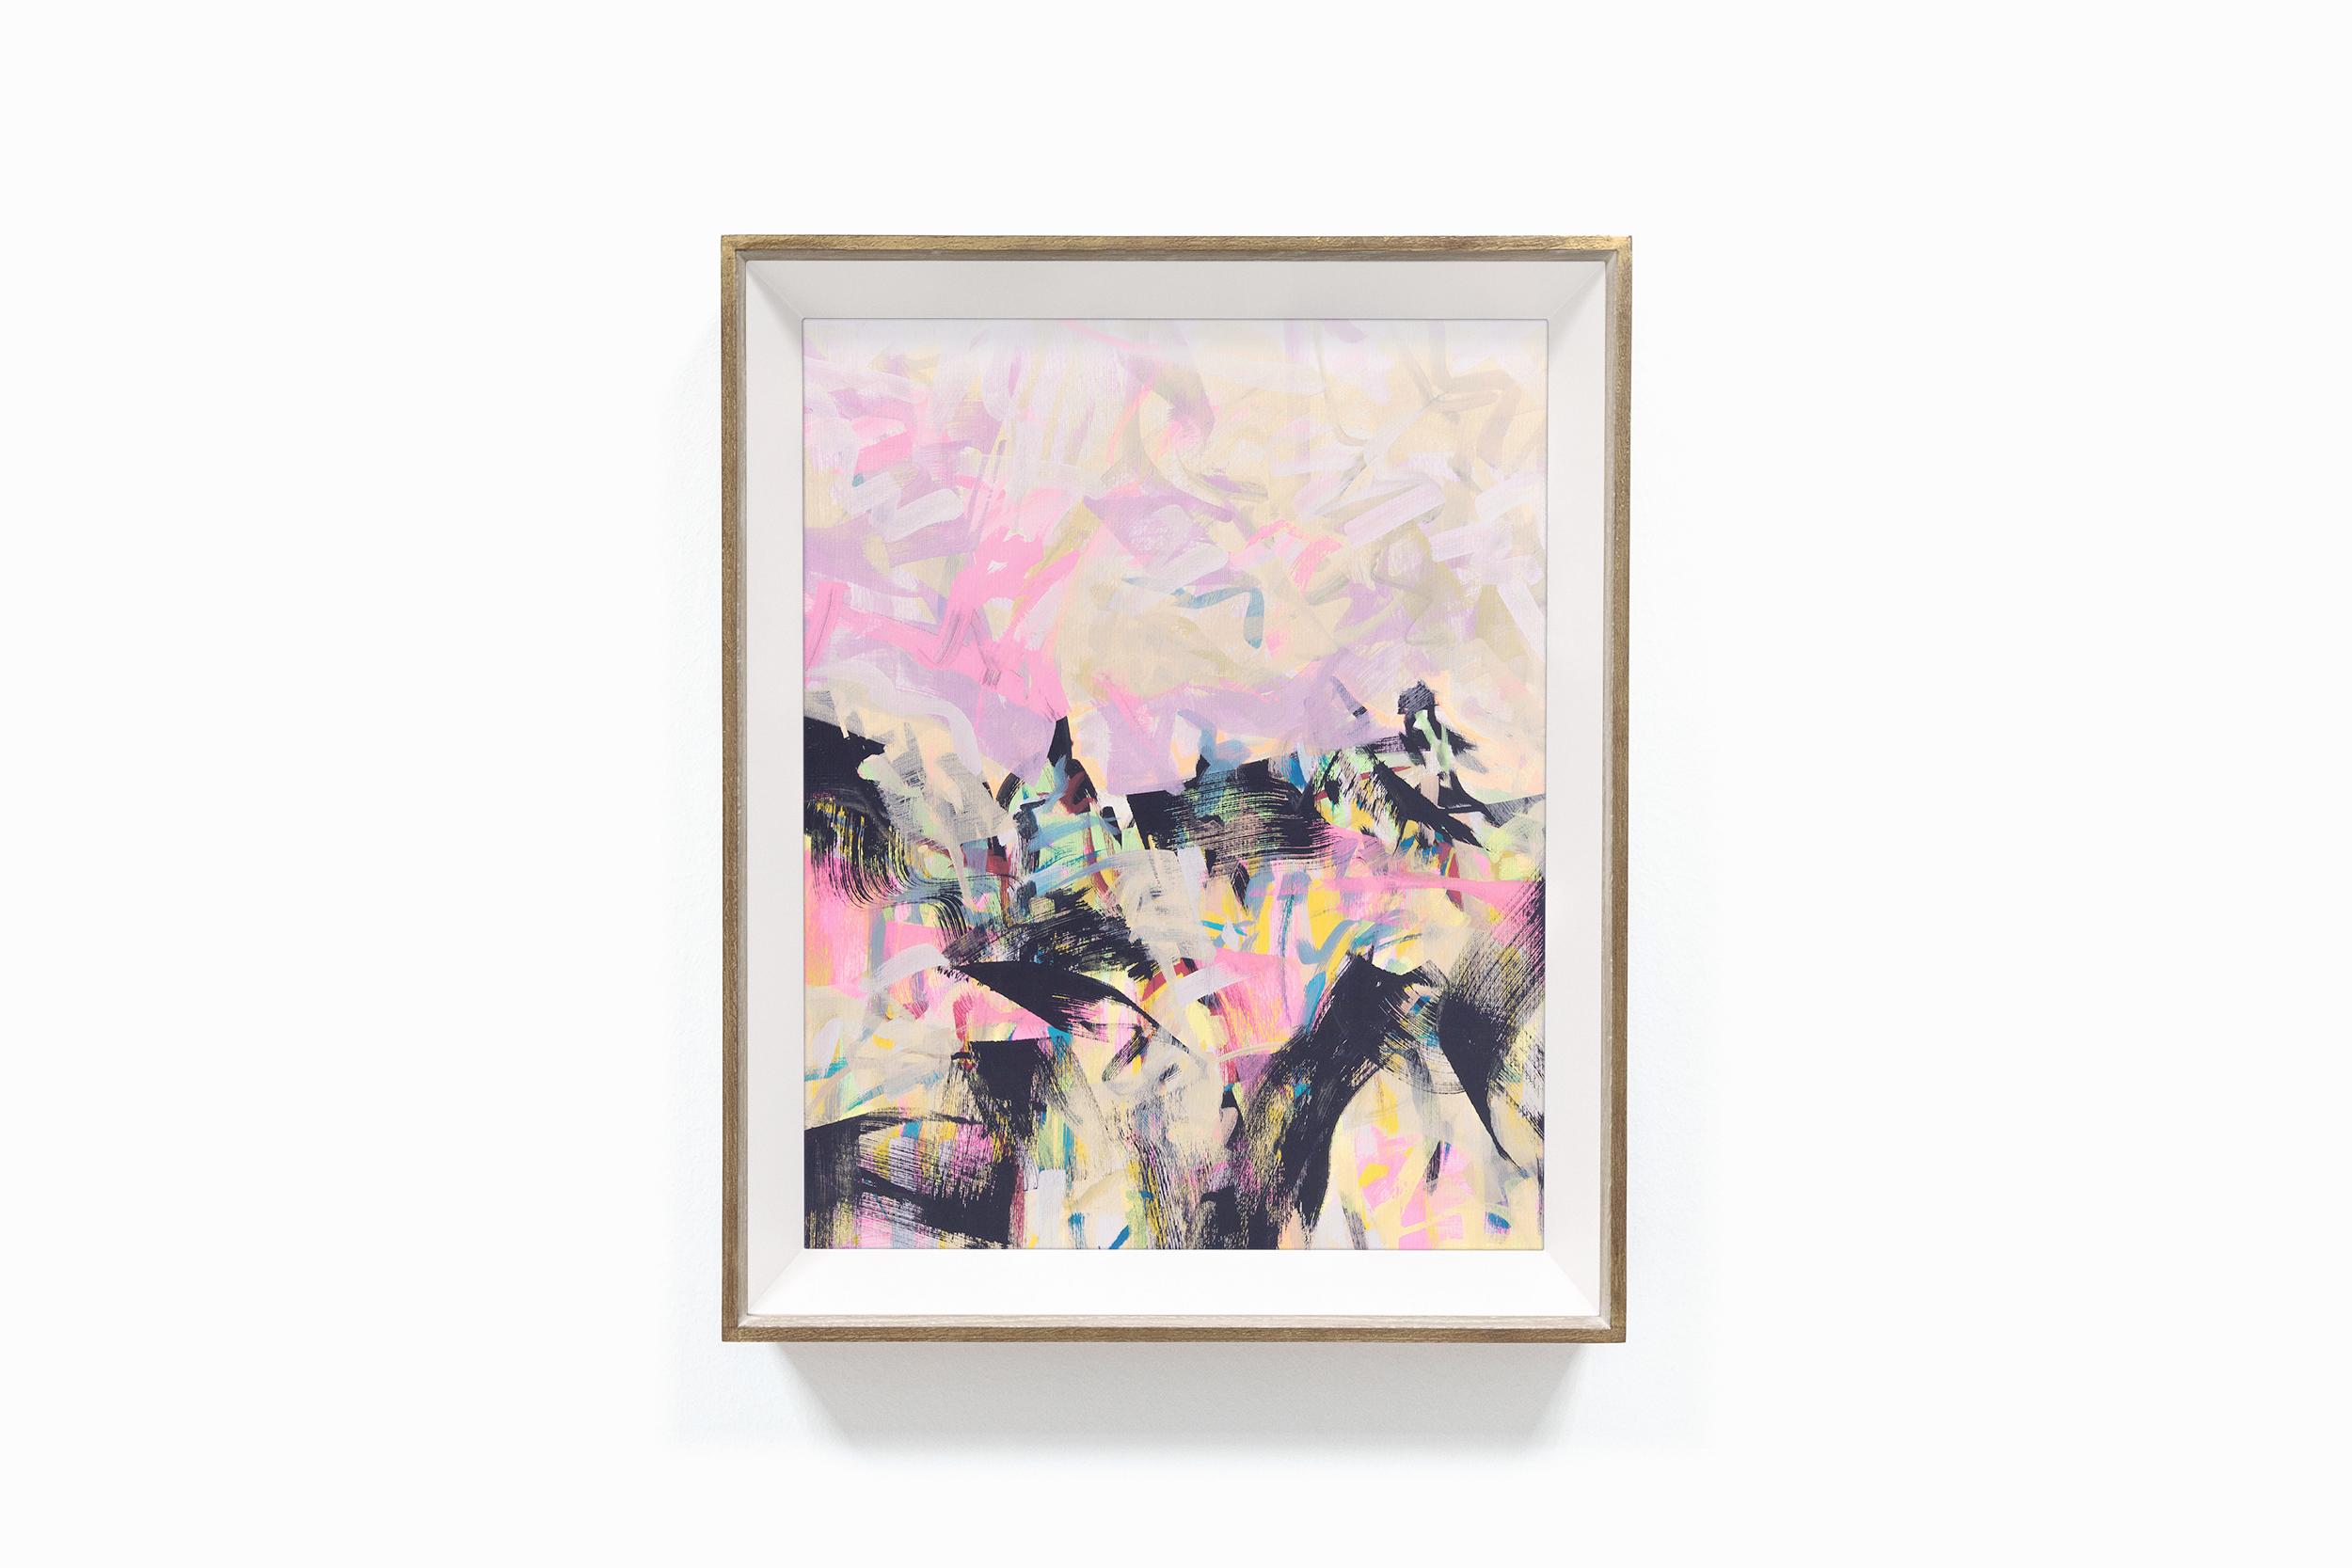 bonjourmolotov+Desniveis+Illustration+Ilustracao+painting+pintura+acrylic+acrílico+canvas+tela+paper+cardboard+mdf+Andre+Gigante+11N5.jpg